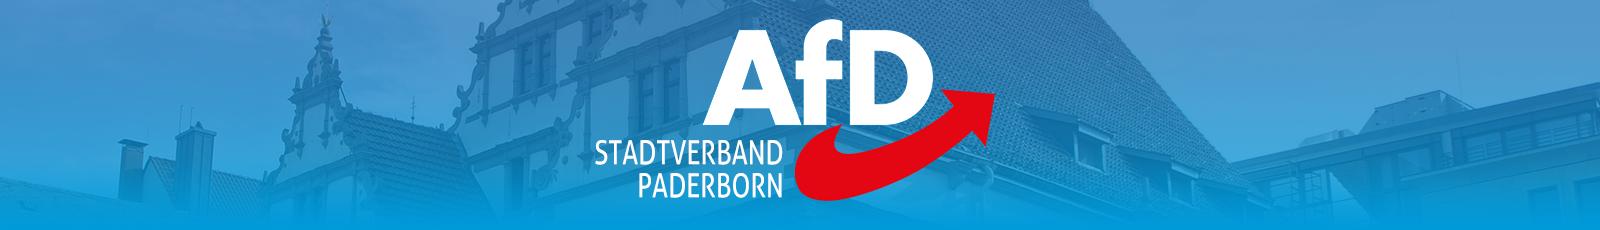 AfD Stadtverband Paderborn